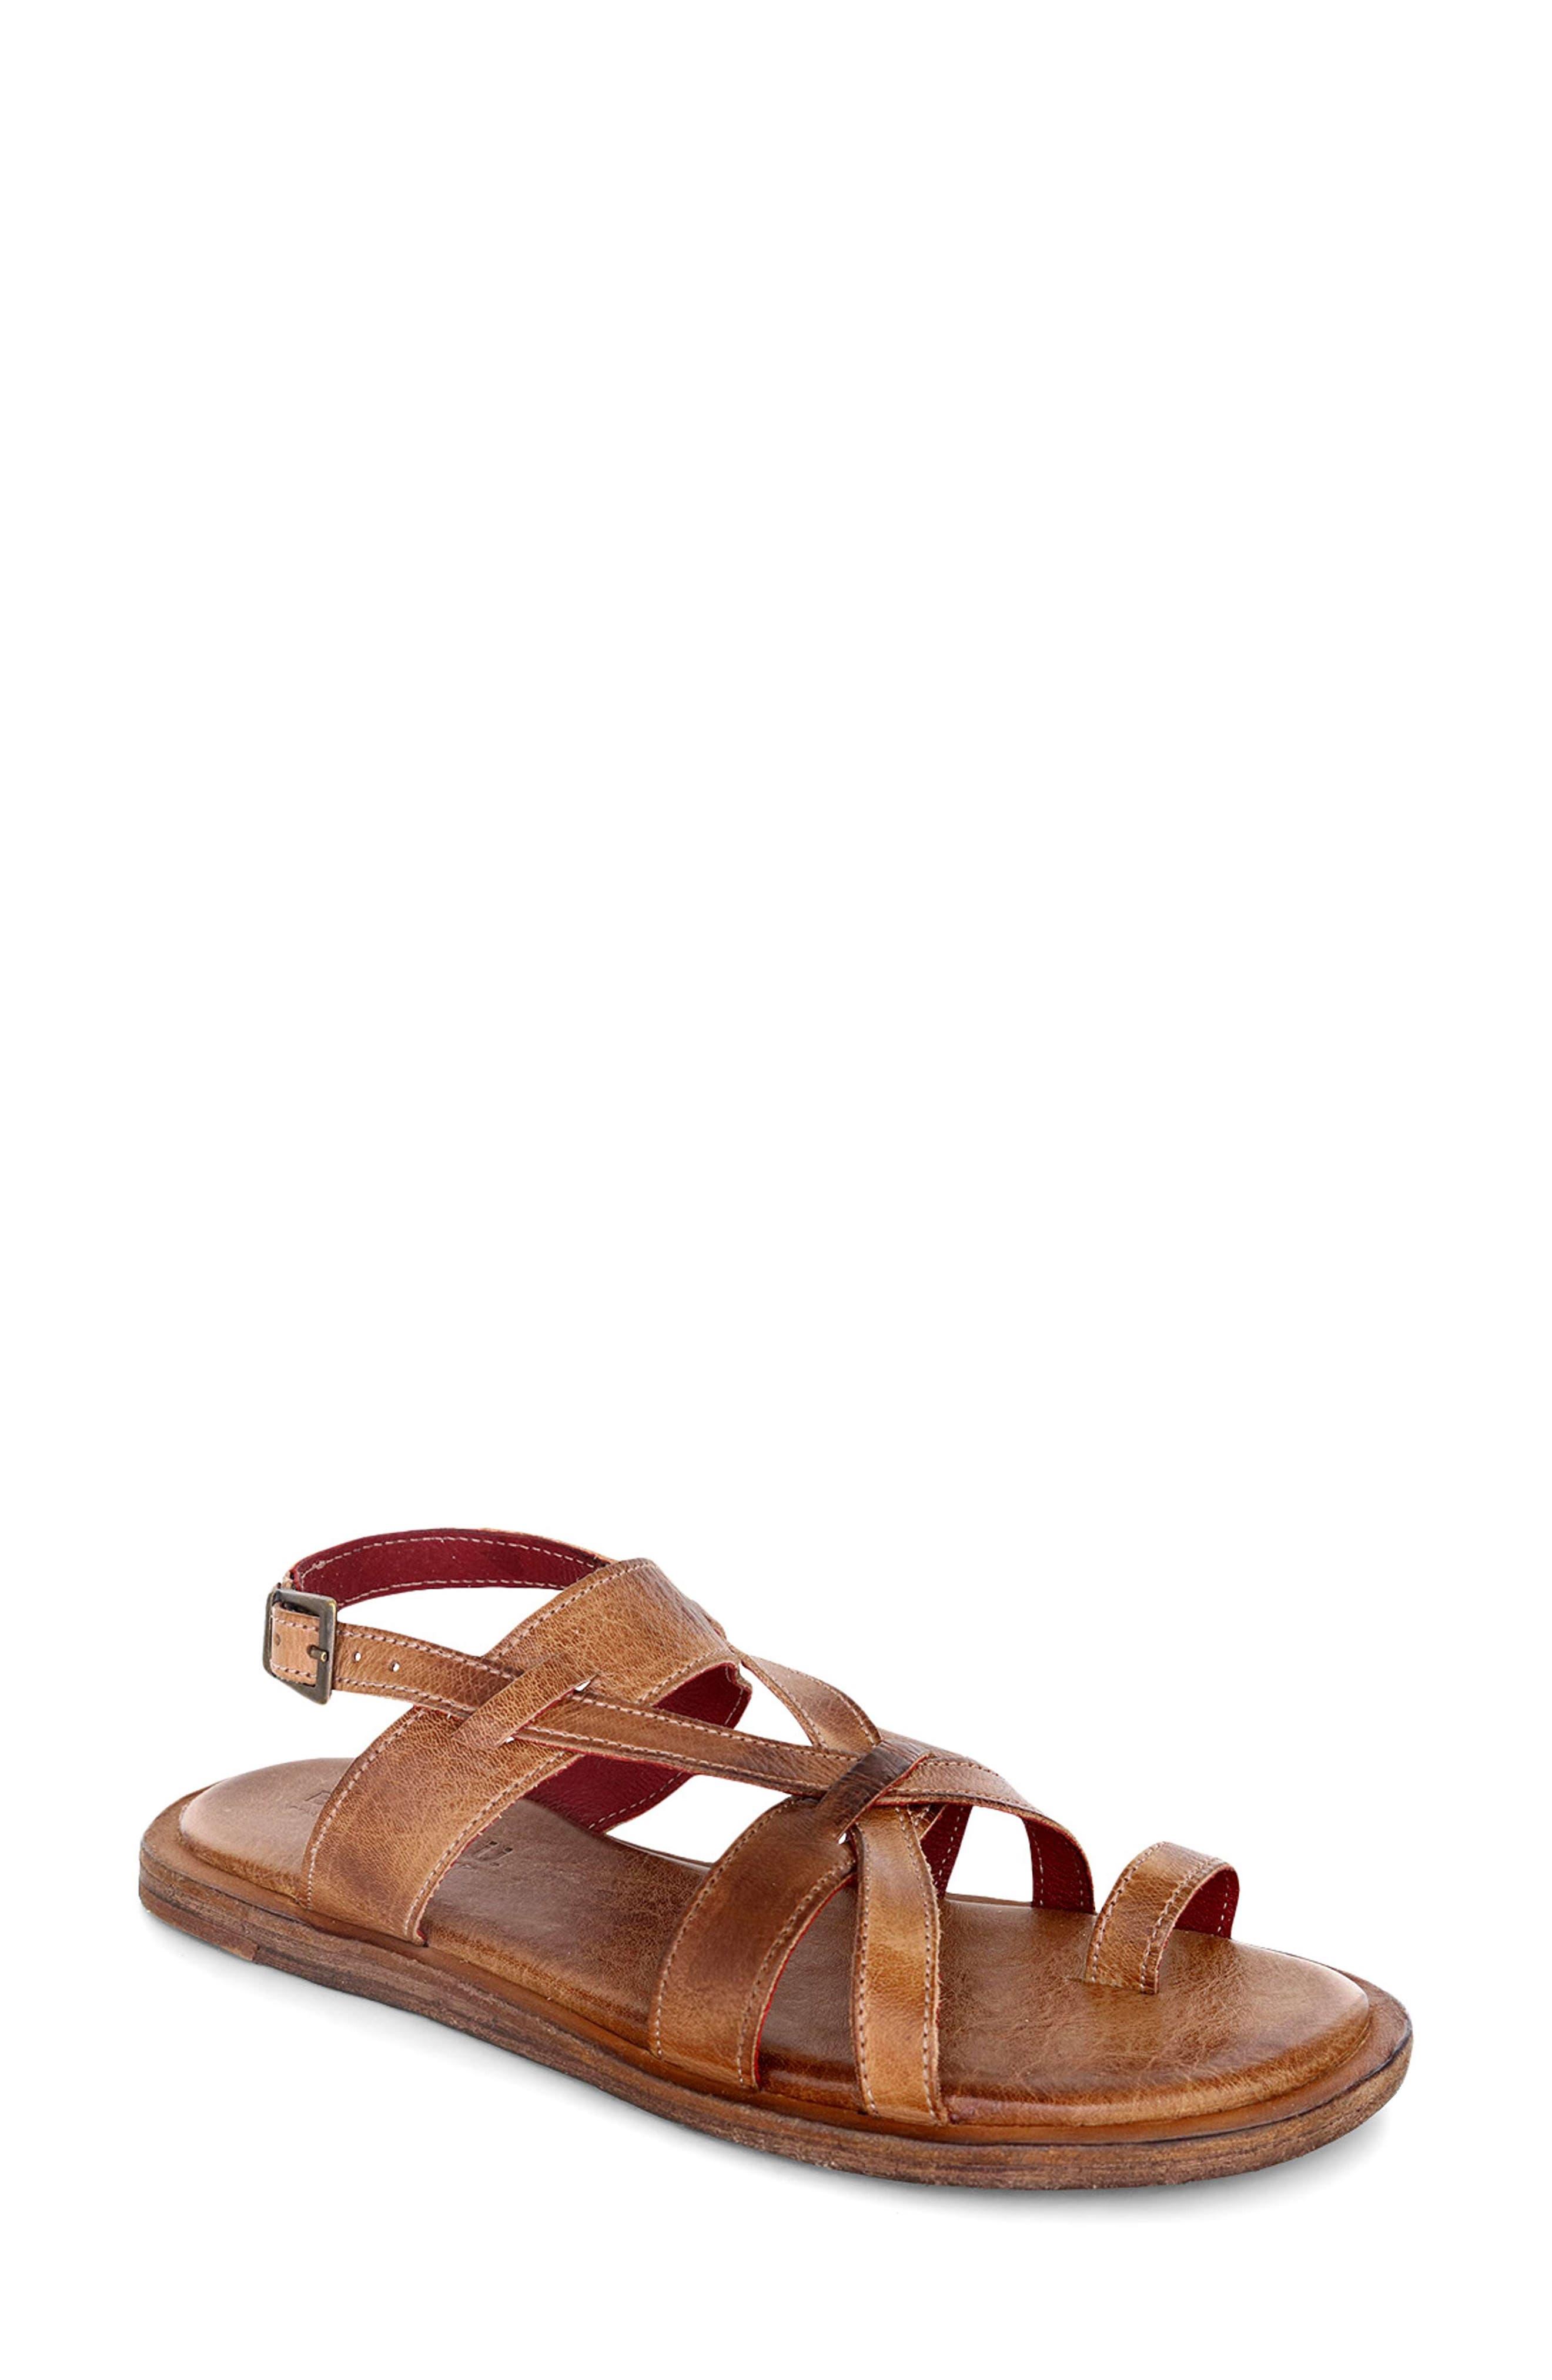 Manati Toe Loop Sandal